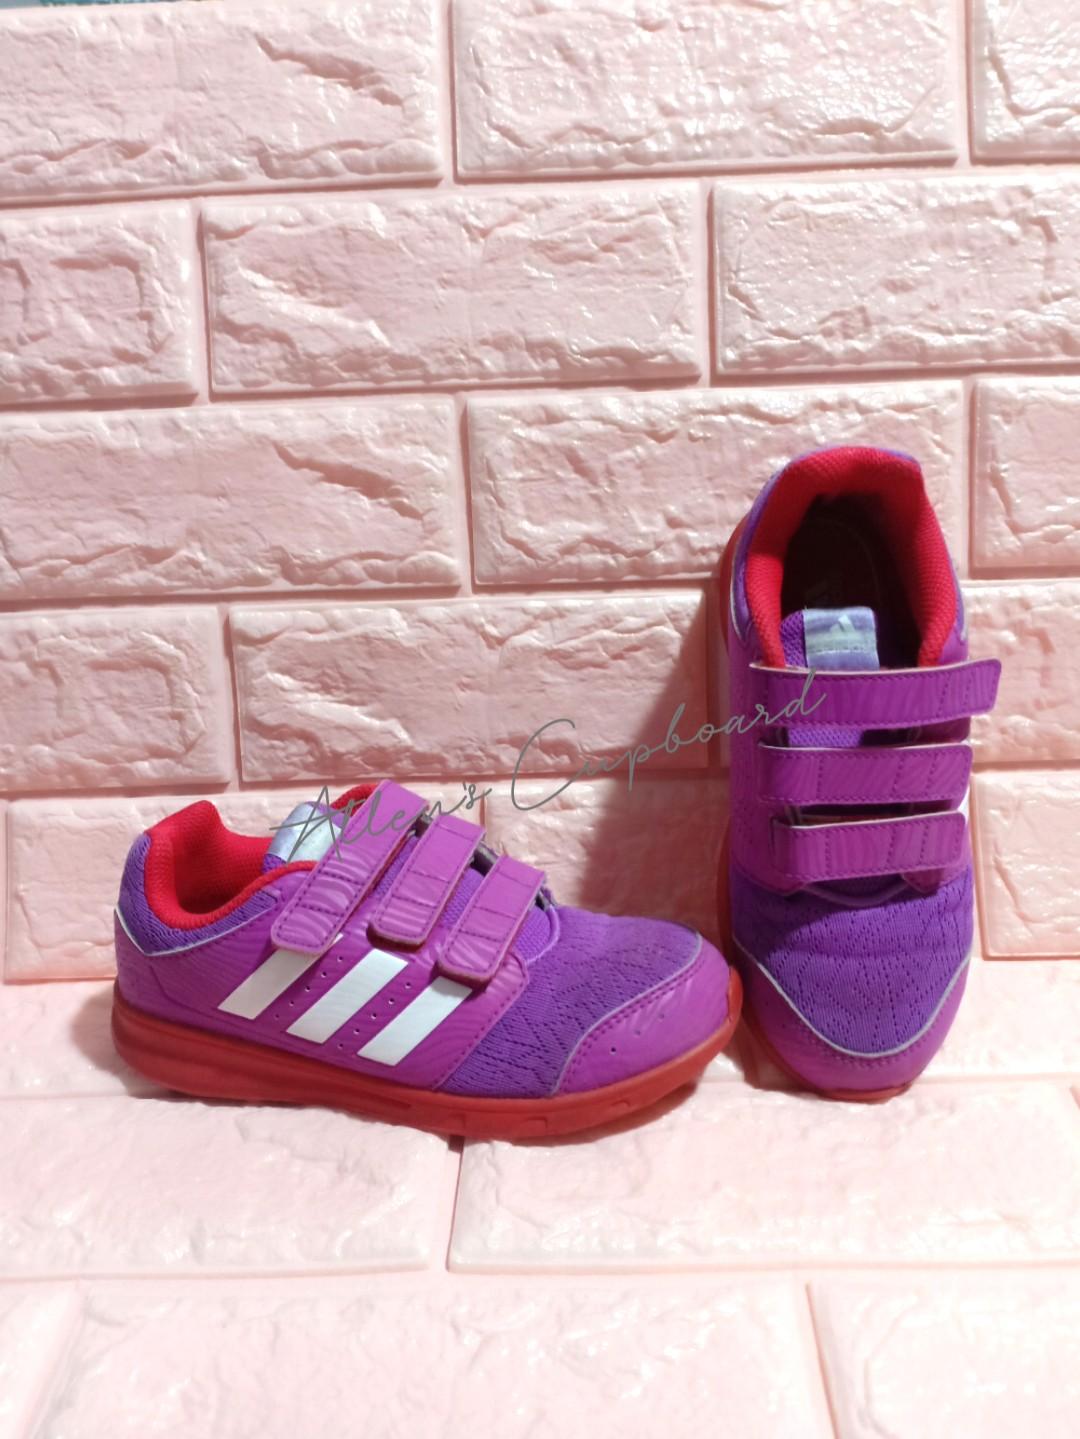 PL Adidas Eco Ortholite Rubber Shoes